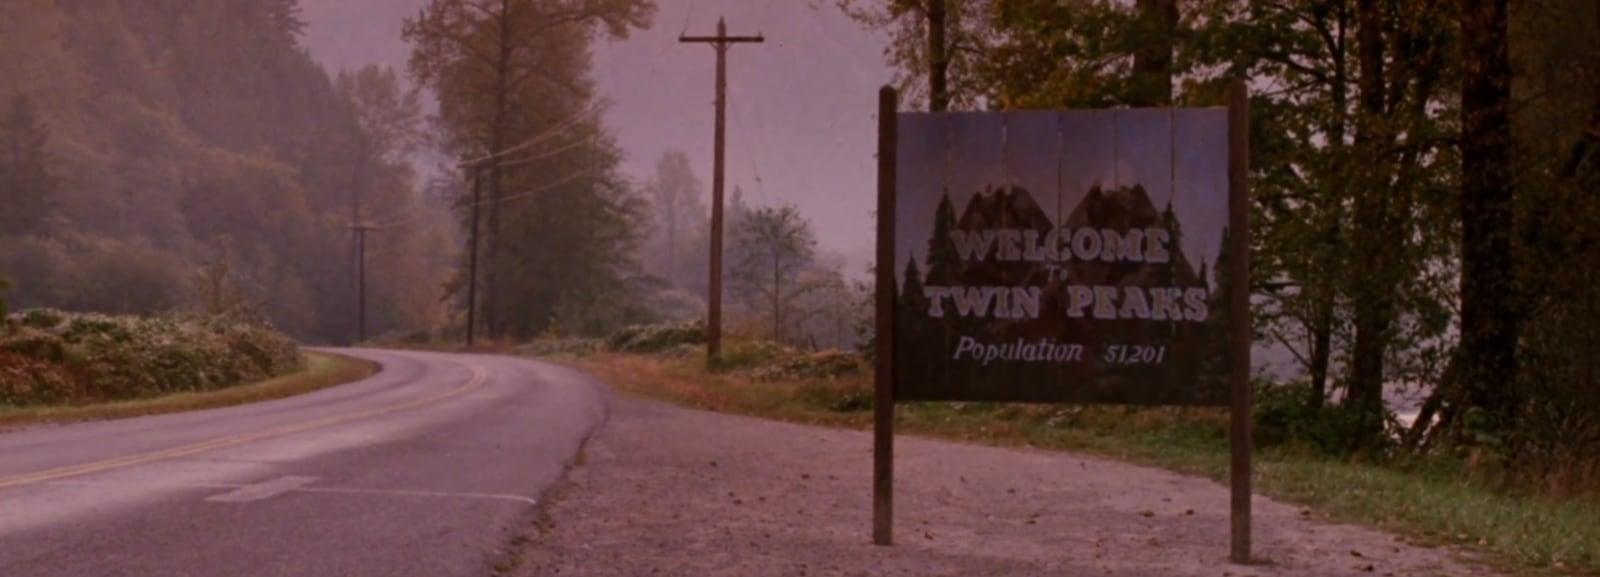 twin peaks_dekstop